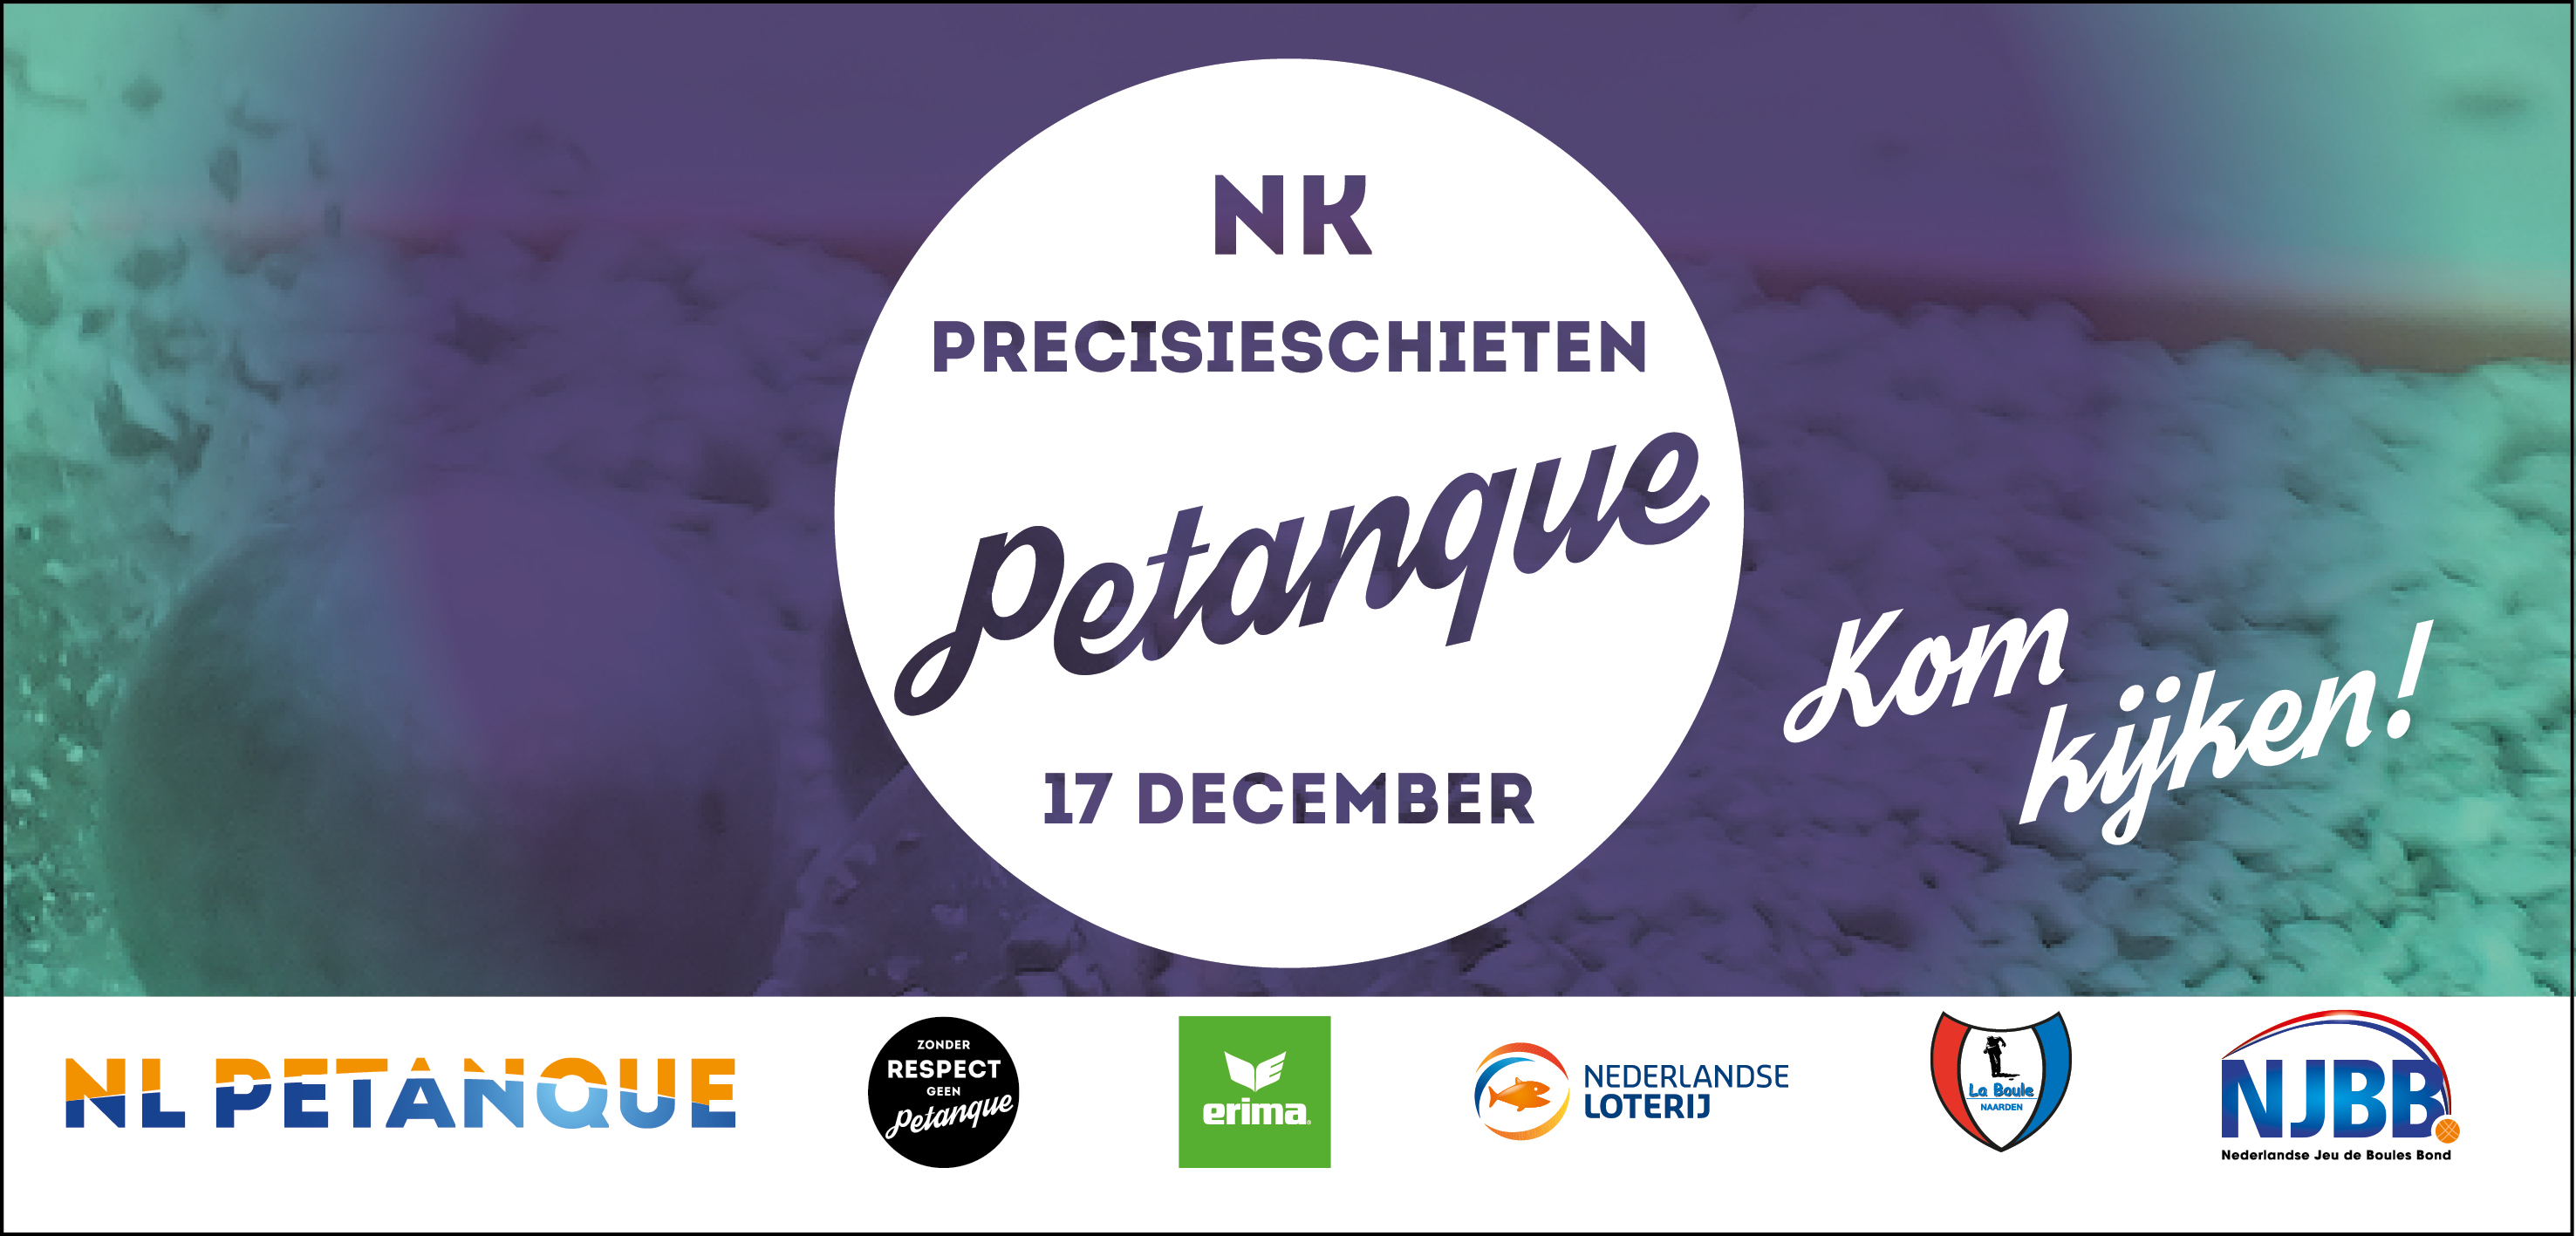 NK precisieschieten 2017 petanque